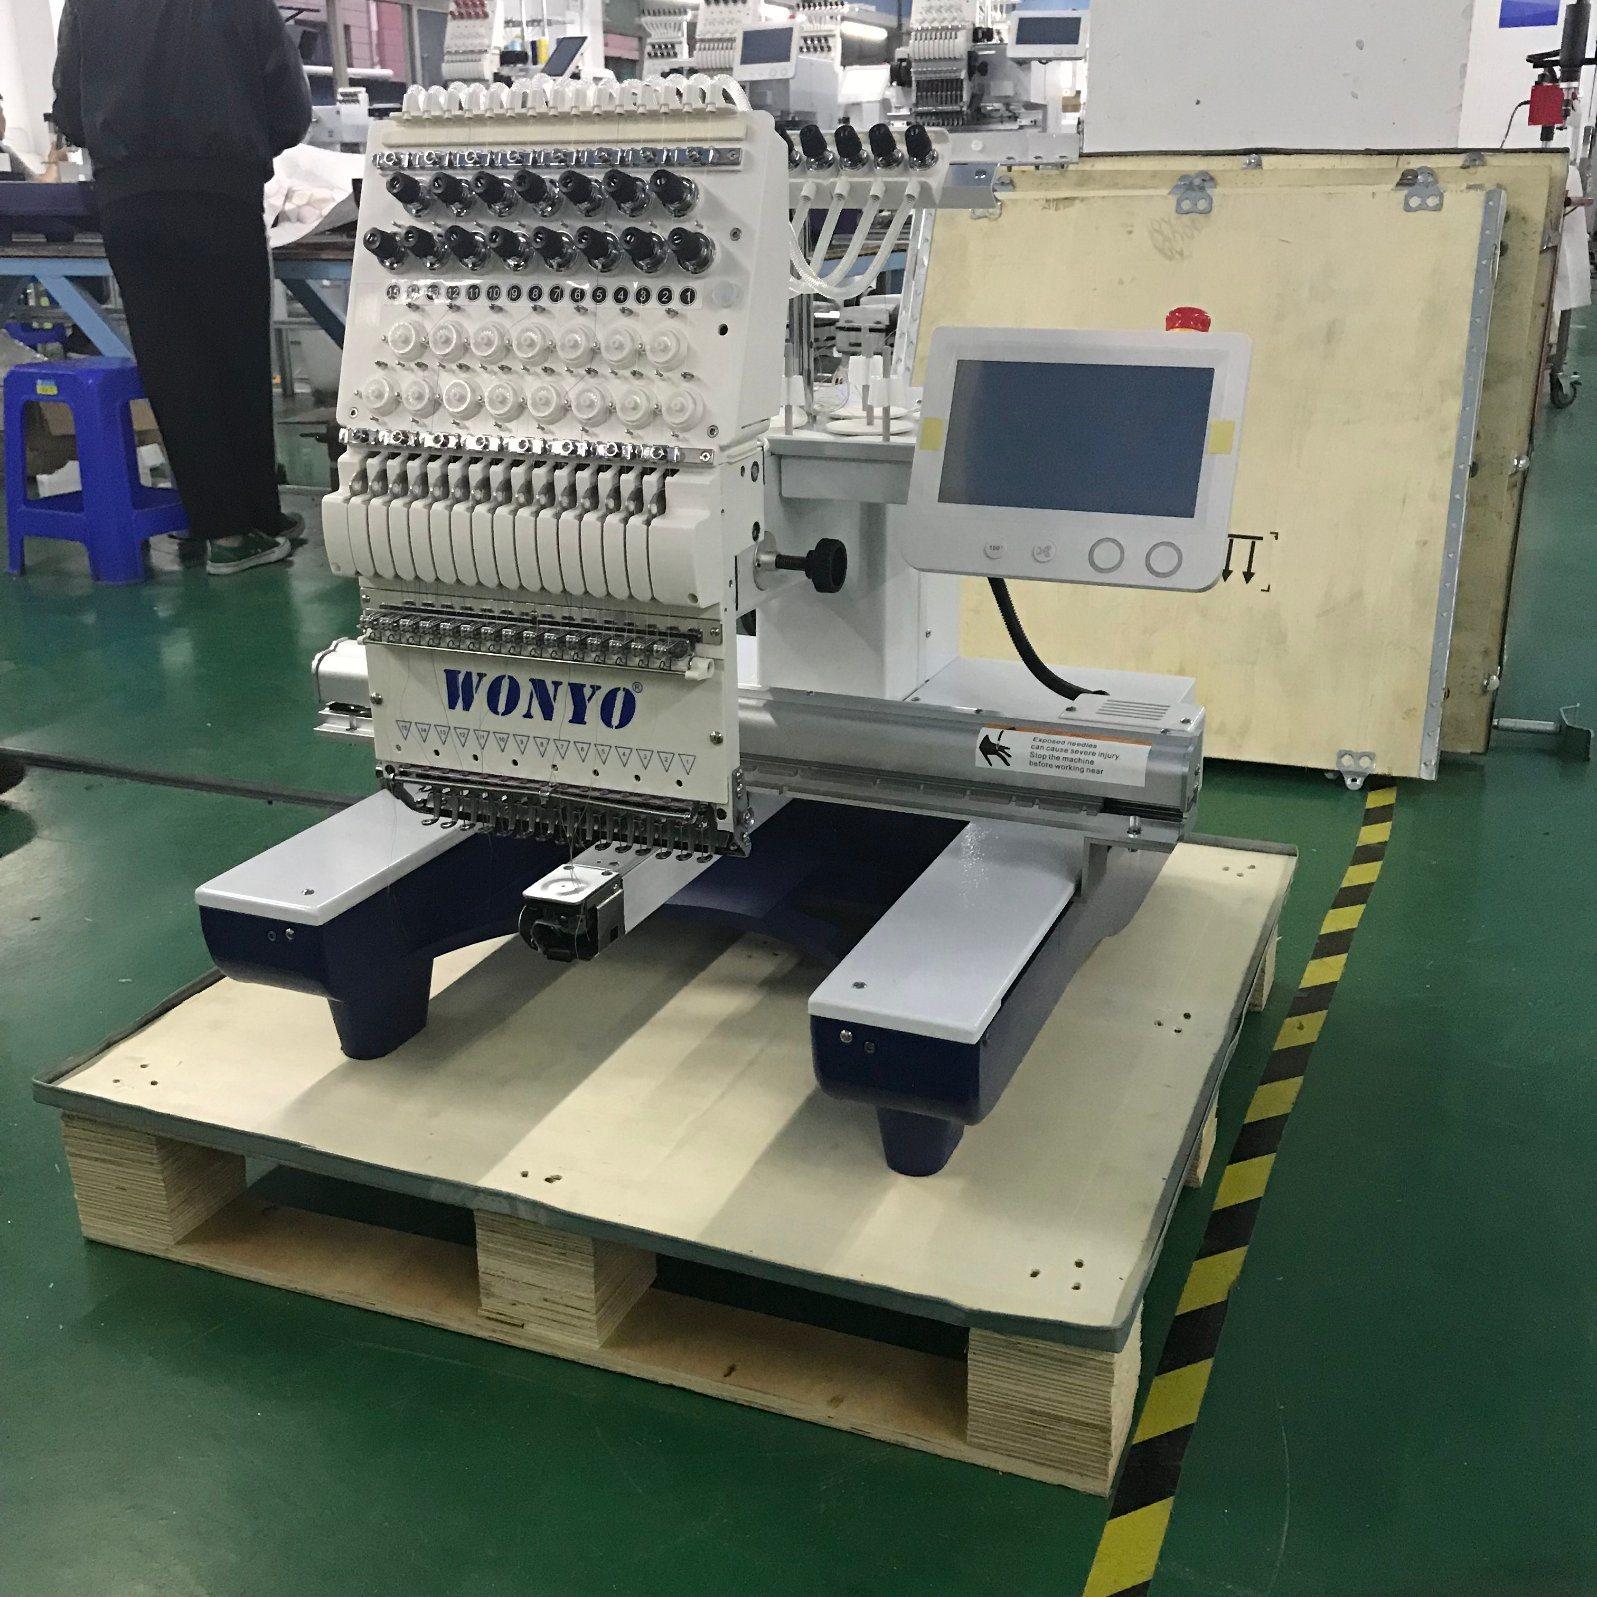 bccbf2aa7ca56 China Single Head Semi-Industrial Cap Embroidery Machine Parts ...